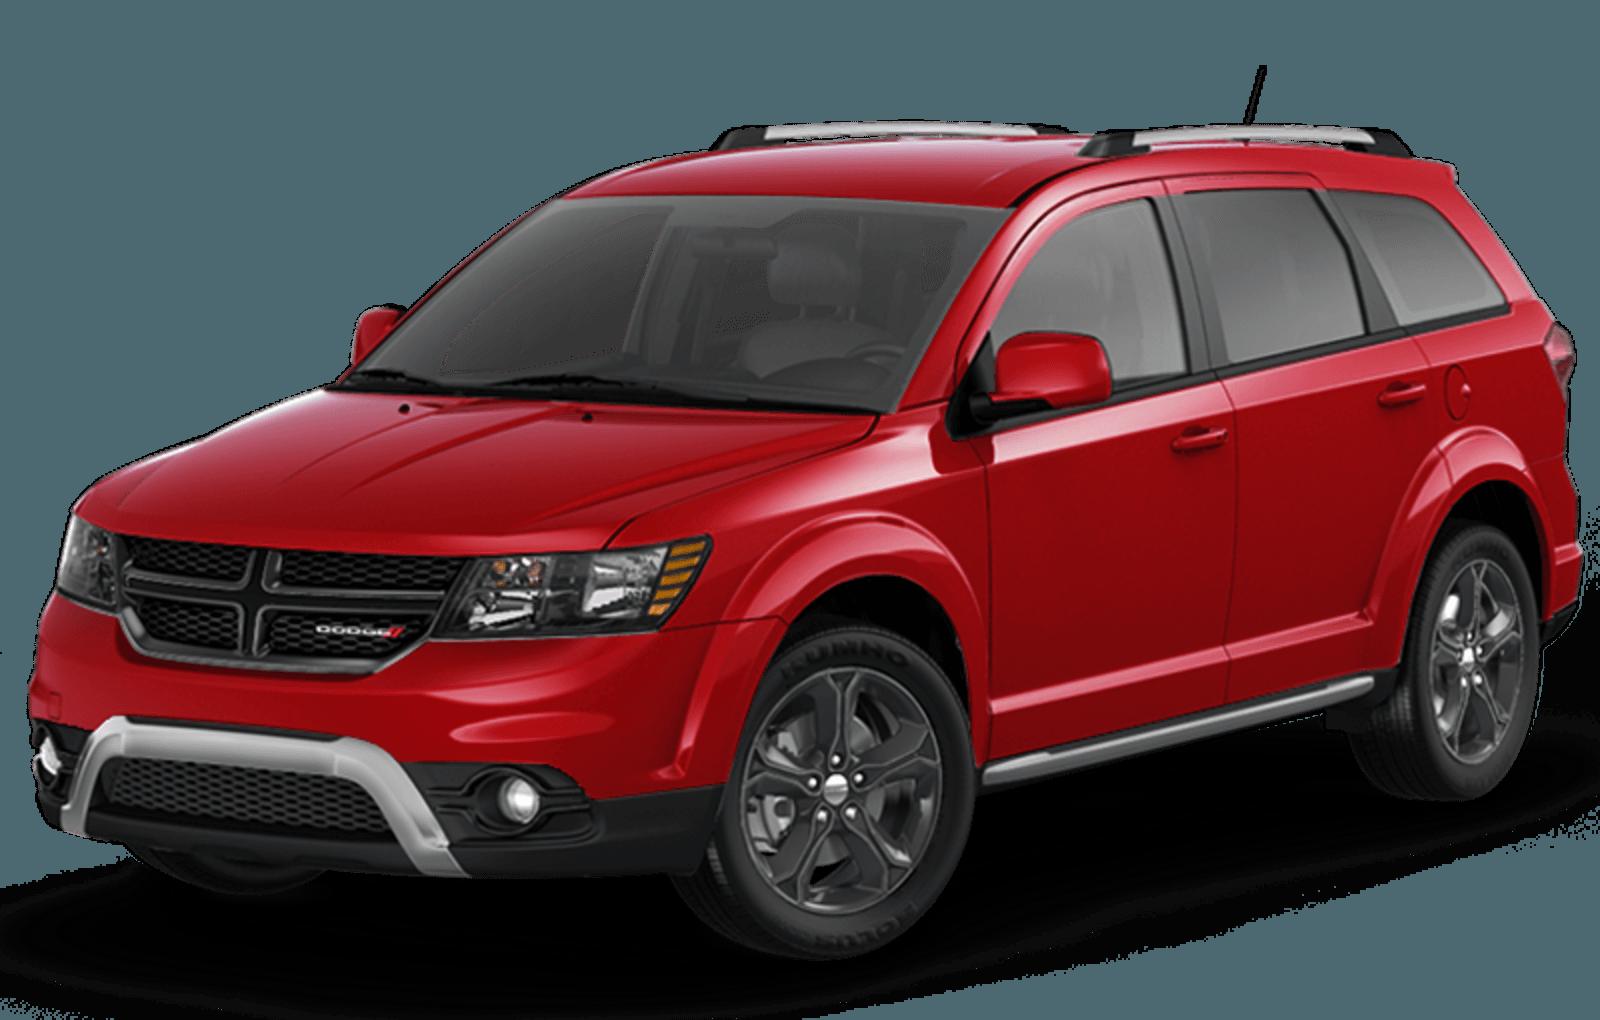 2019 Dodge Journey - Crossover SUV | Dodge Canada